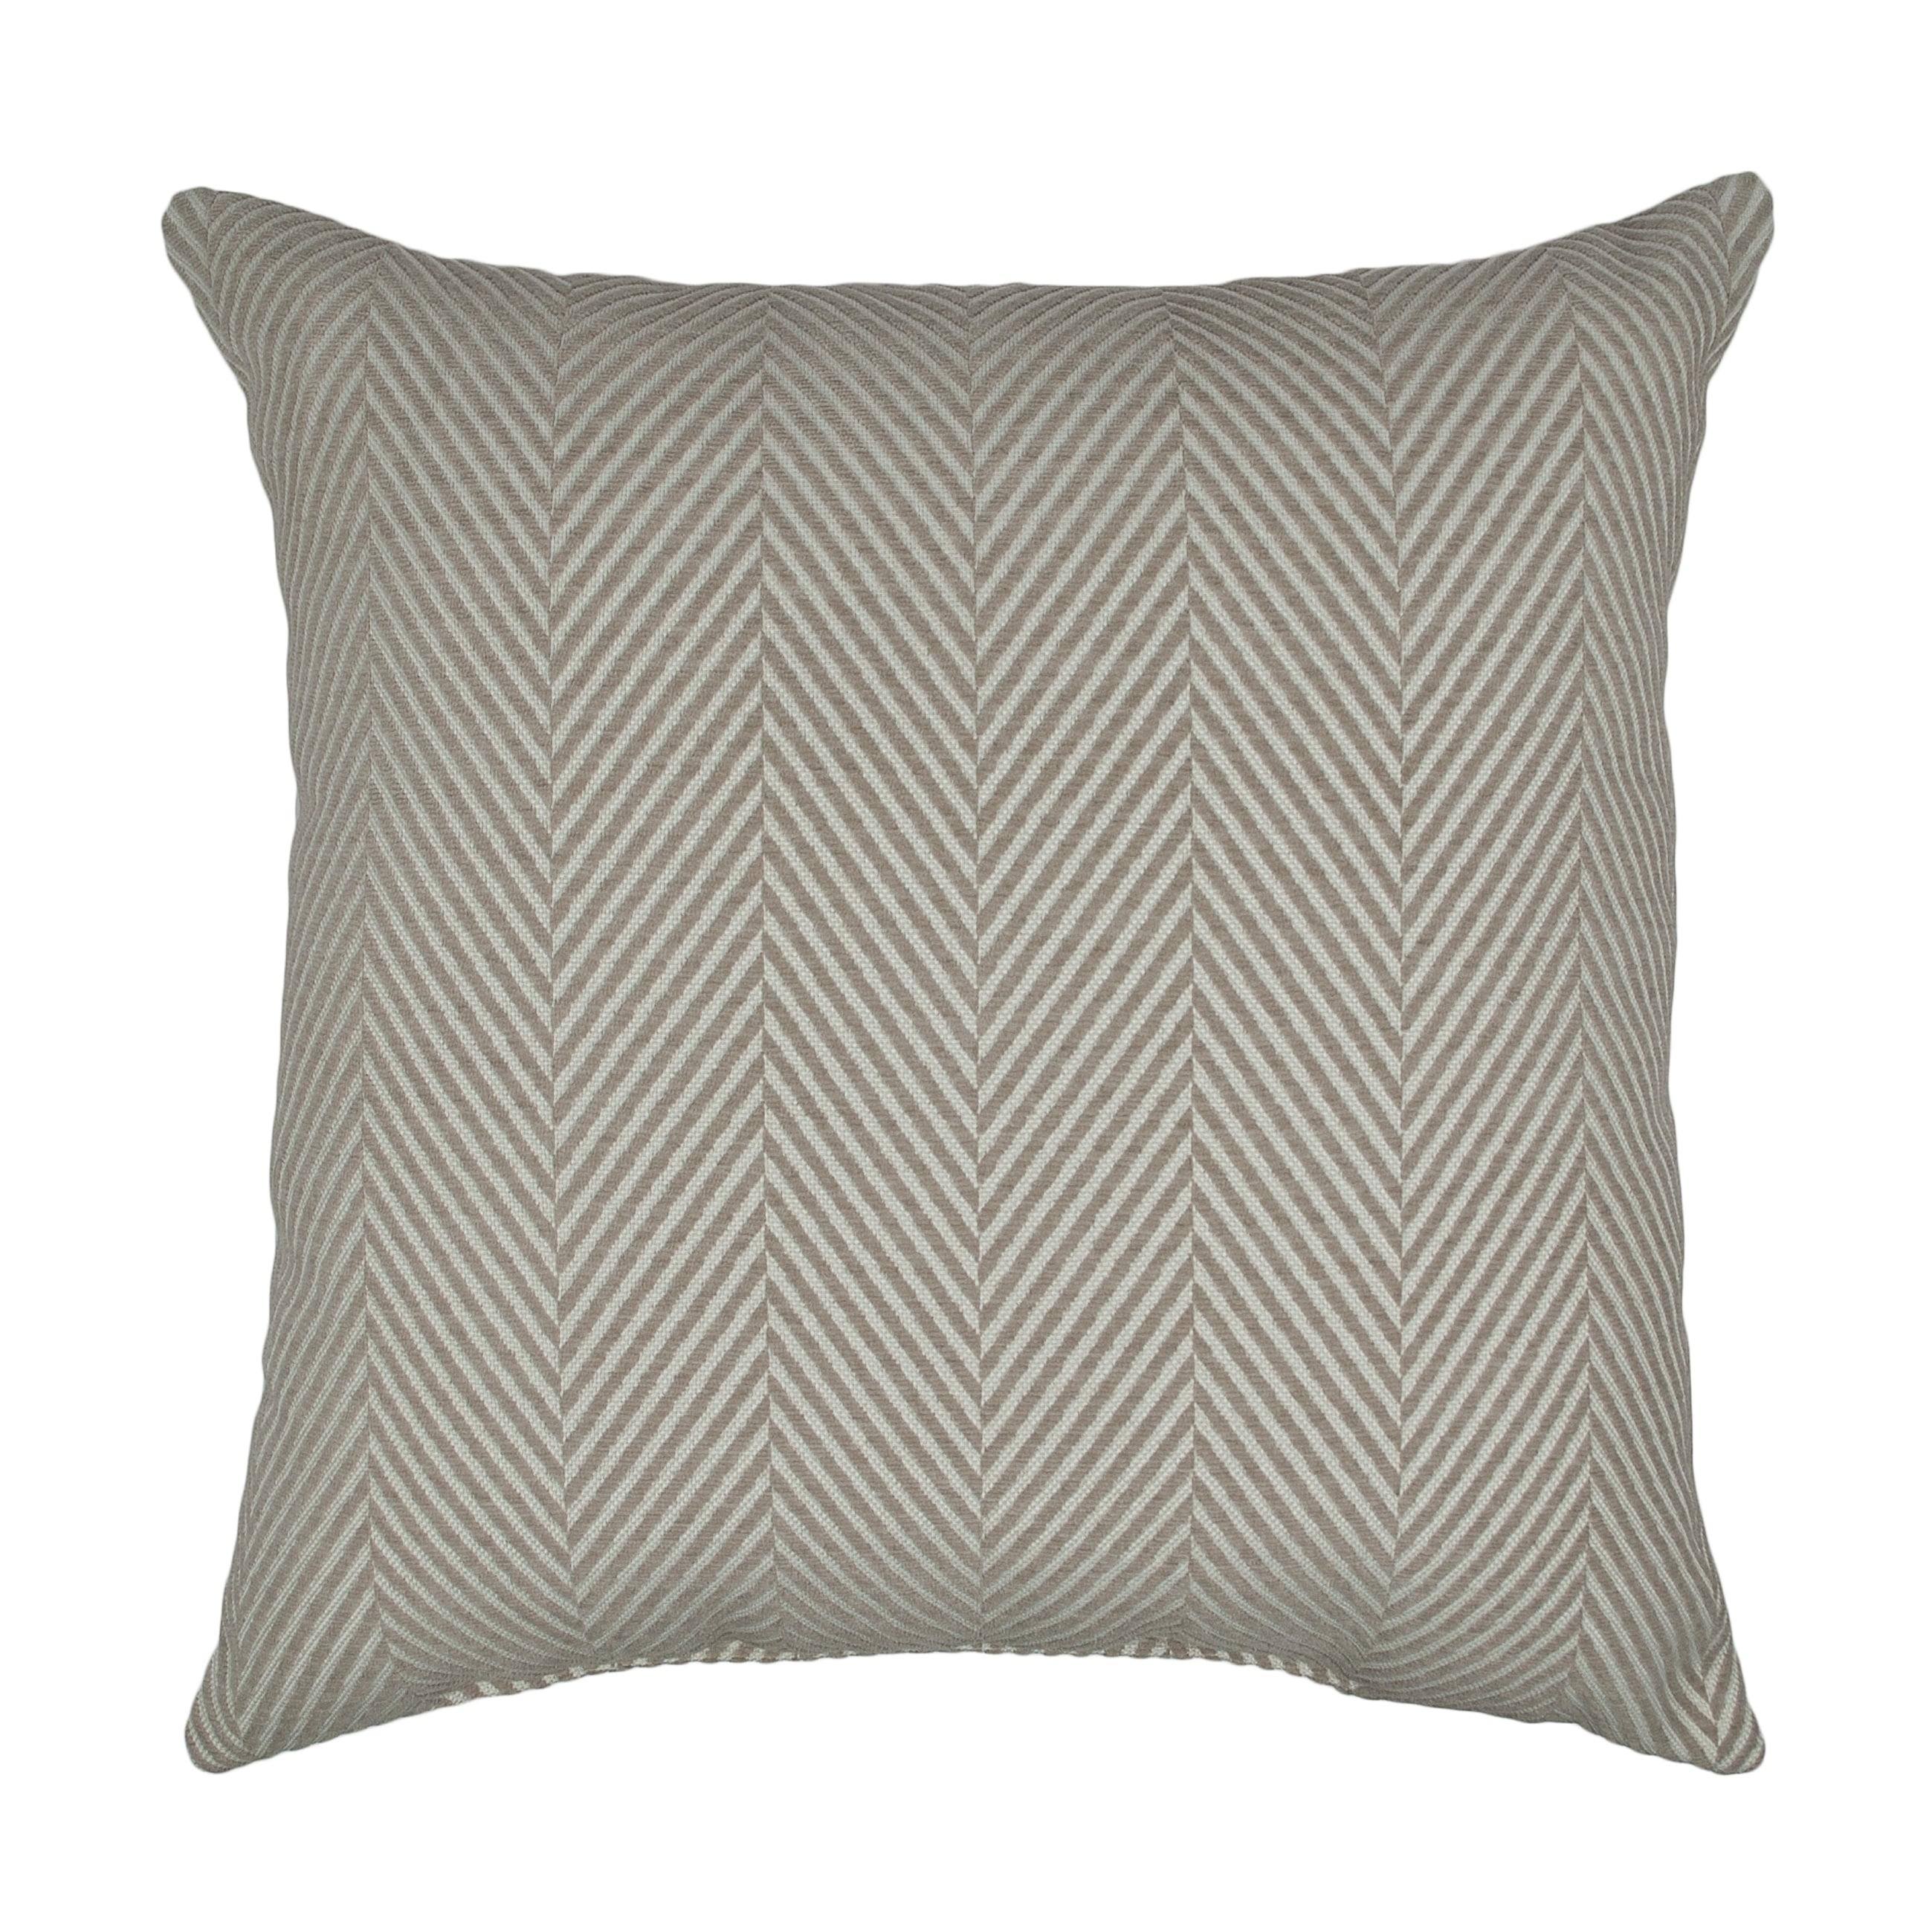 Sherry Kline Chevron Chenille 20-inch Decorative Pillow - taupe